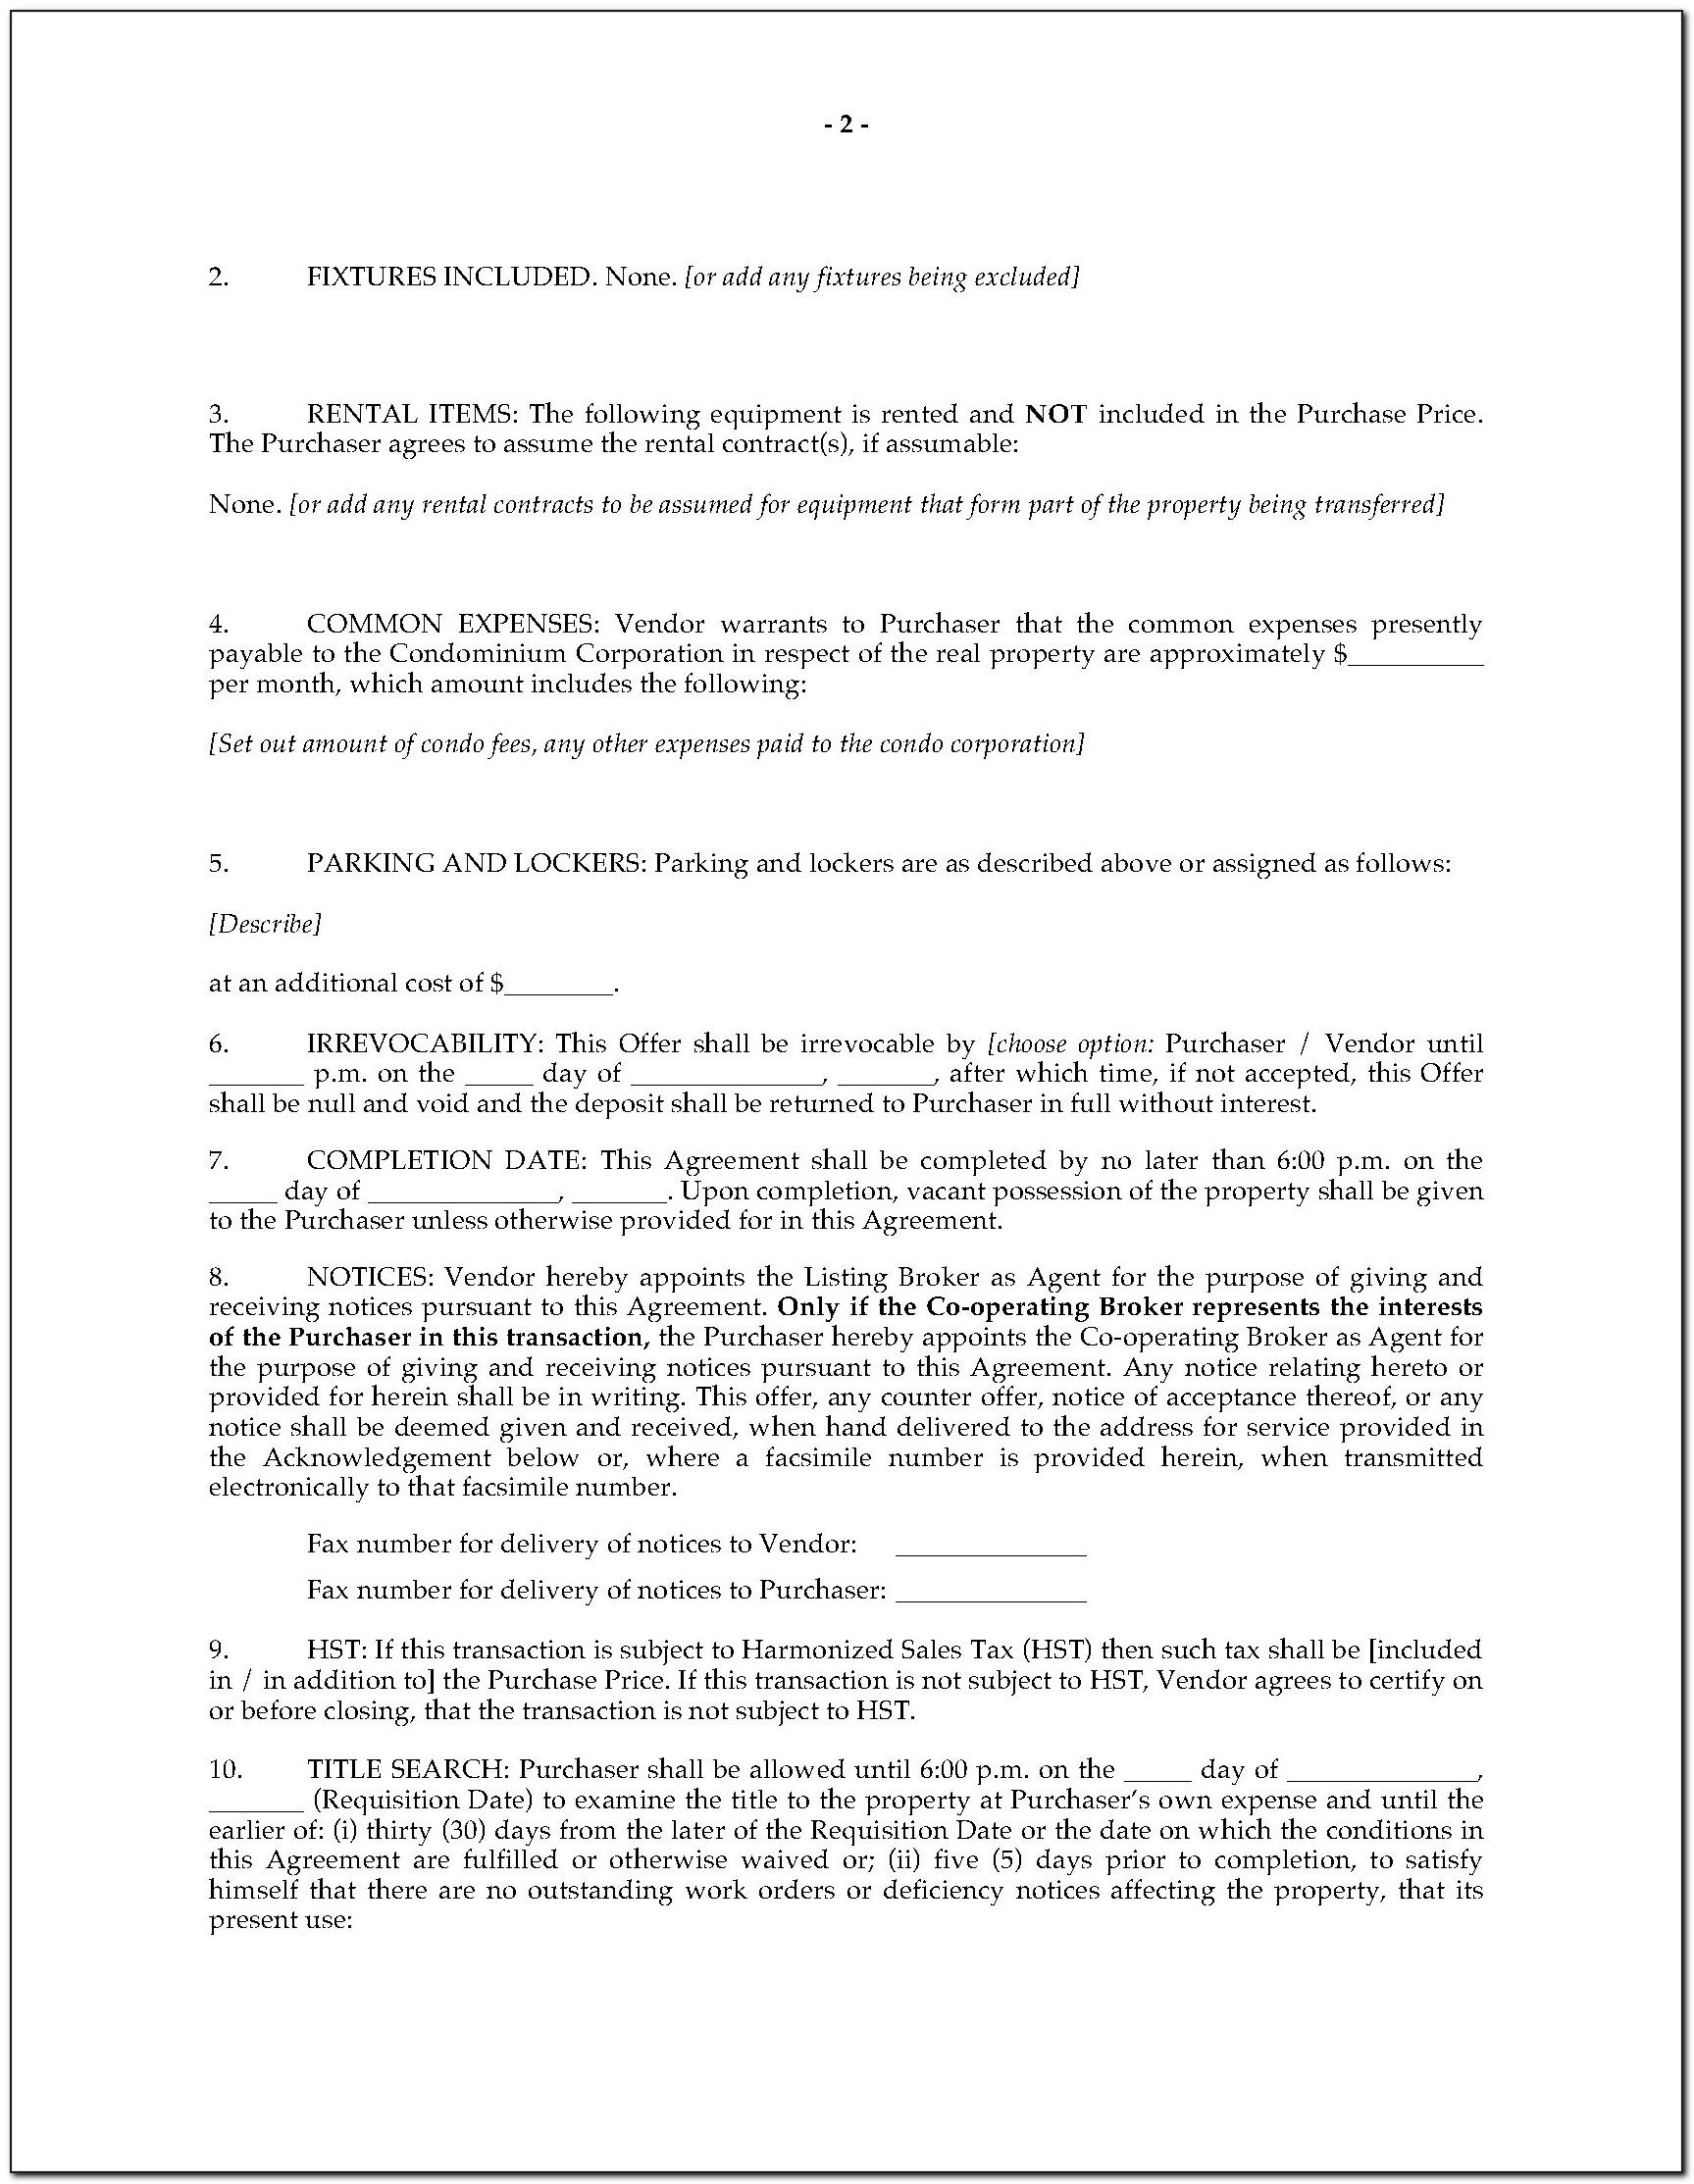 Marriott Free Night Certificate Cancellation